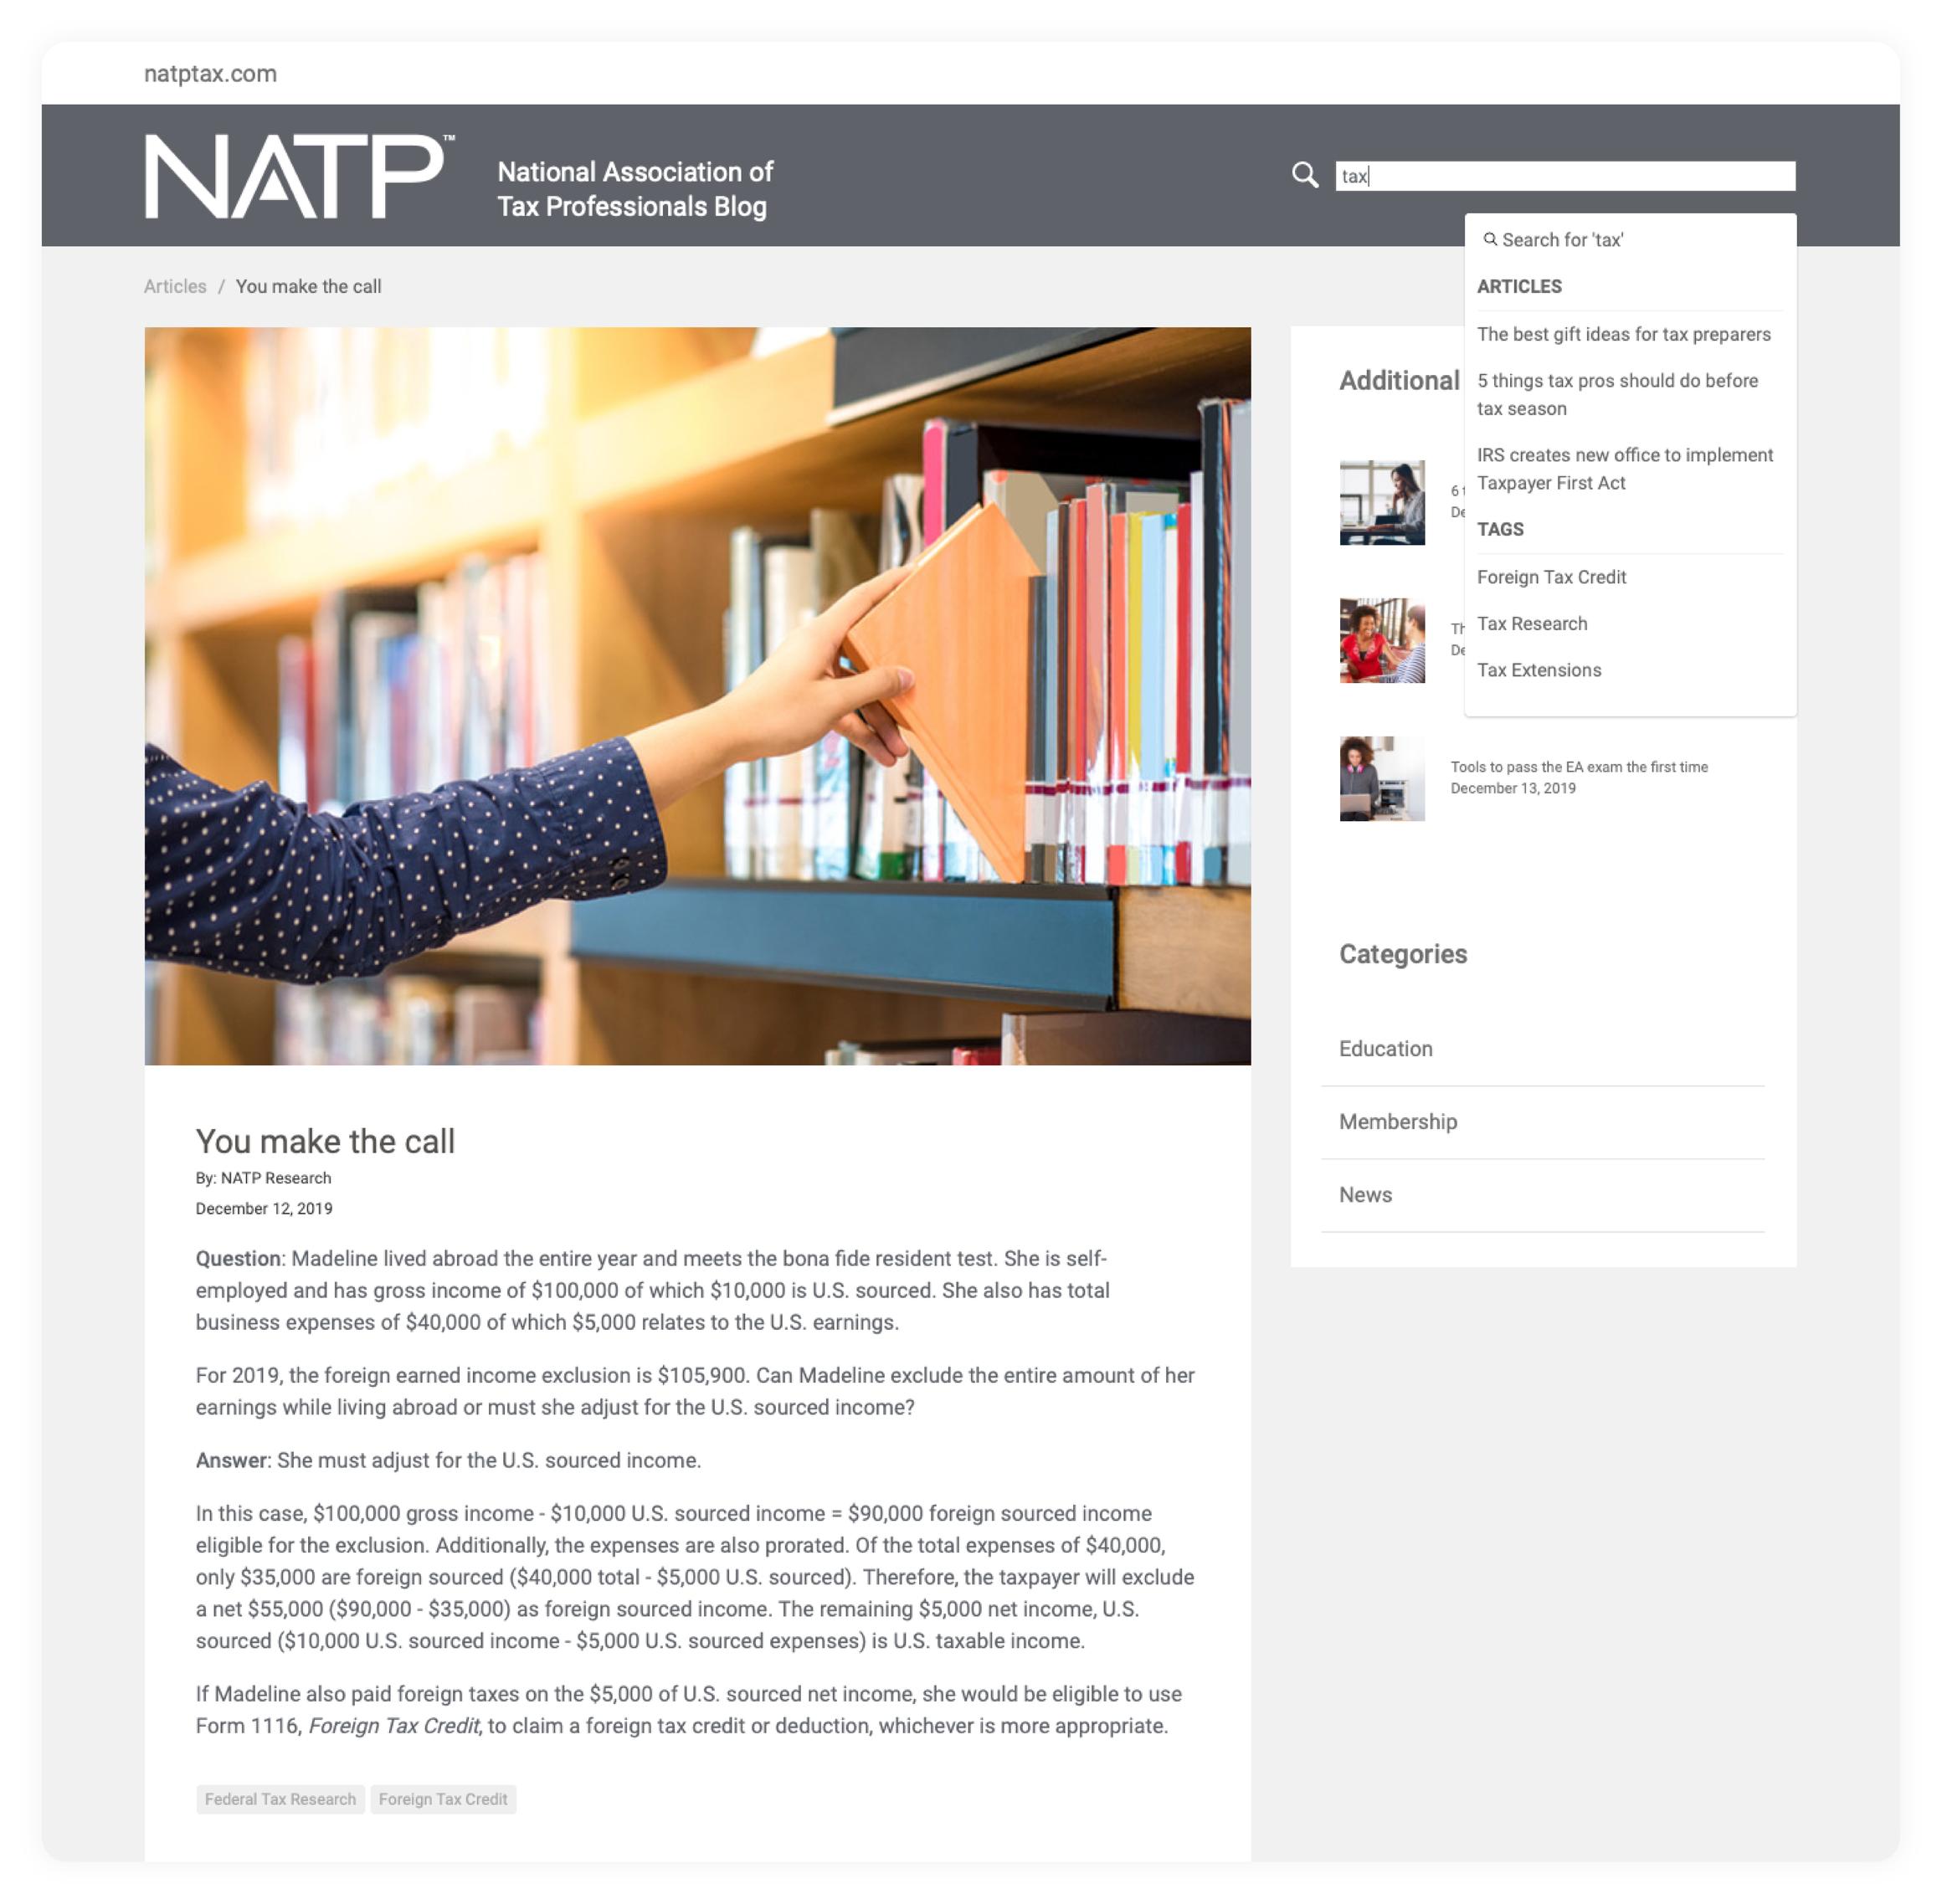 NATP NATP National Association of Tax Professionals